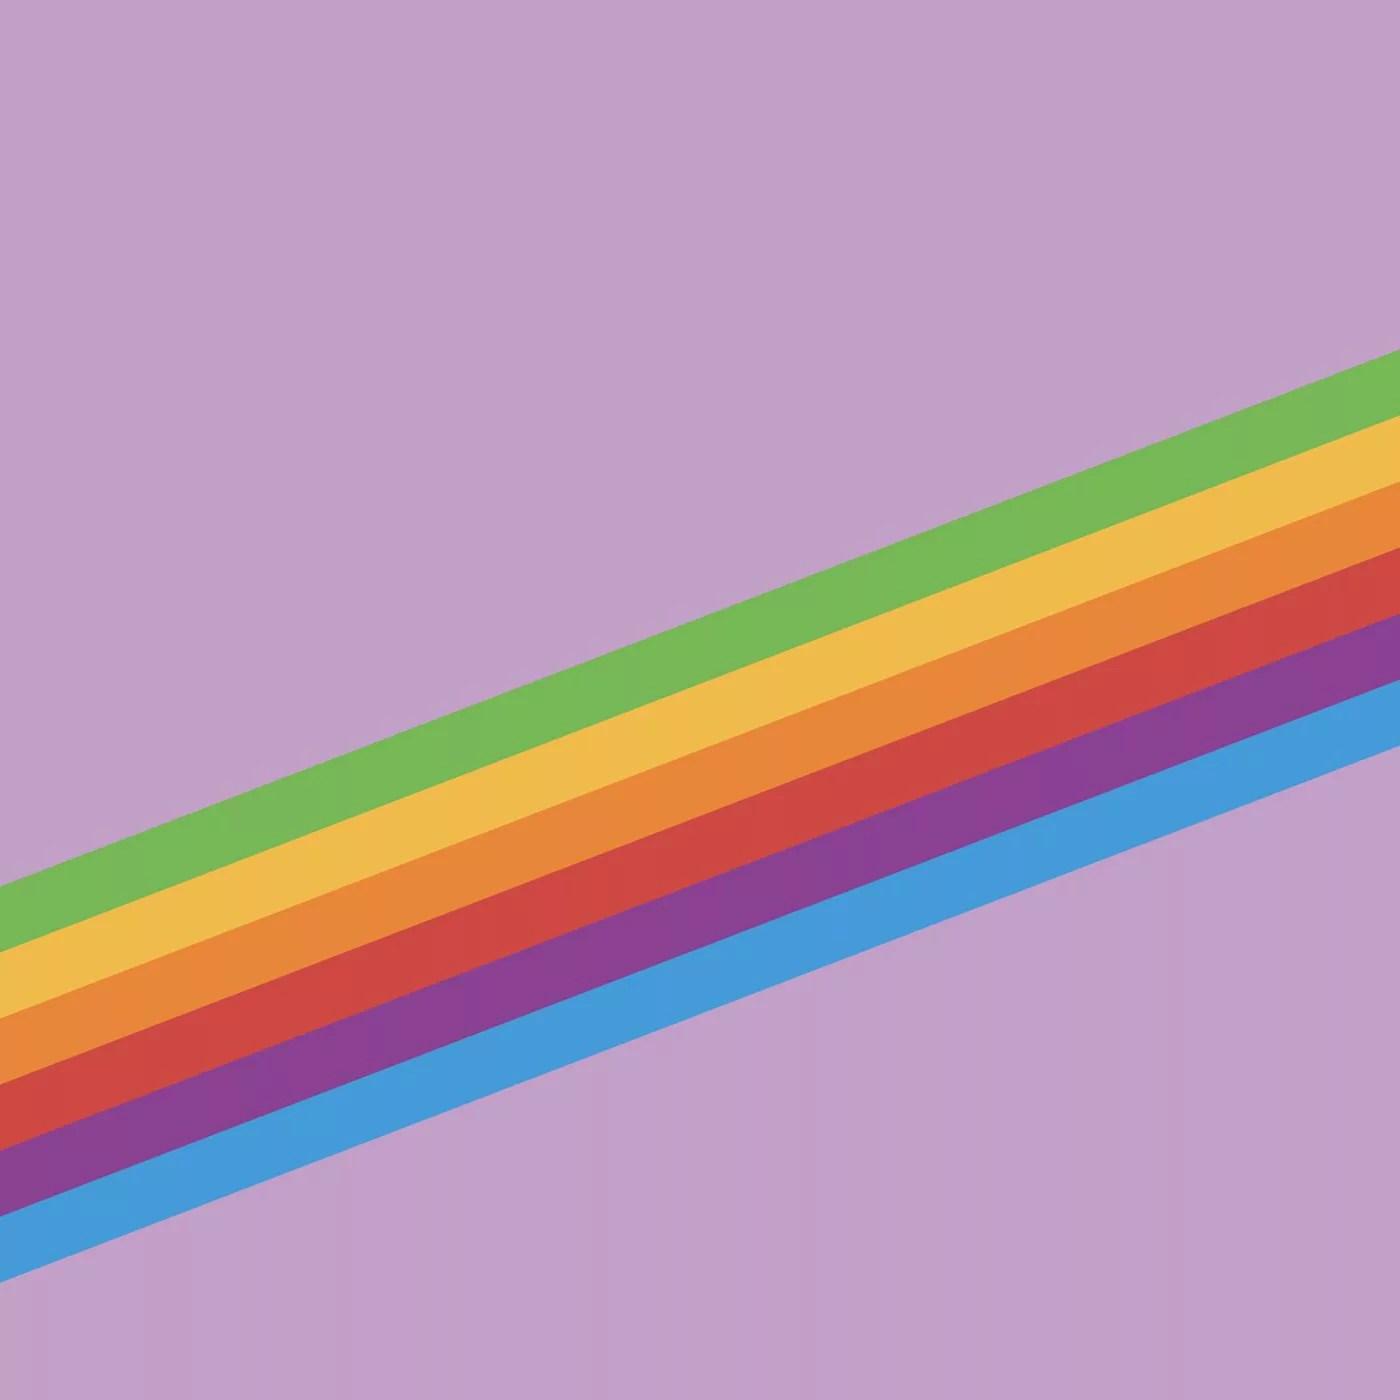 ios_11_gm_wallpaper_heritage_stripe_purple.jpg